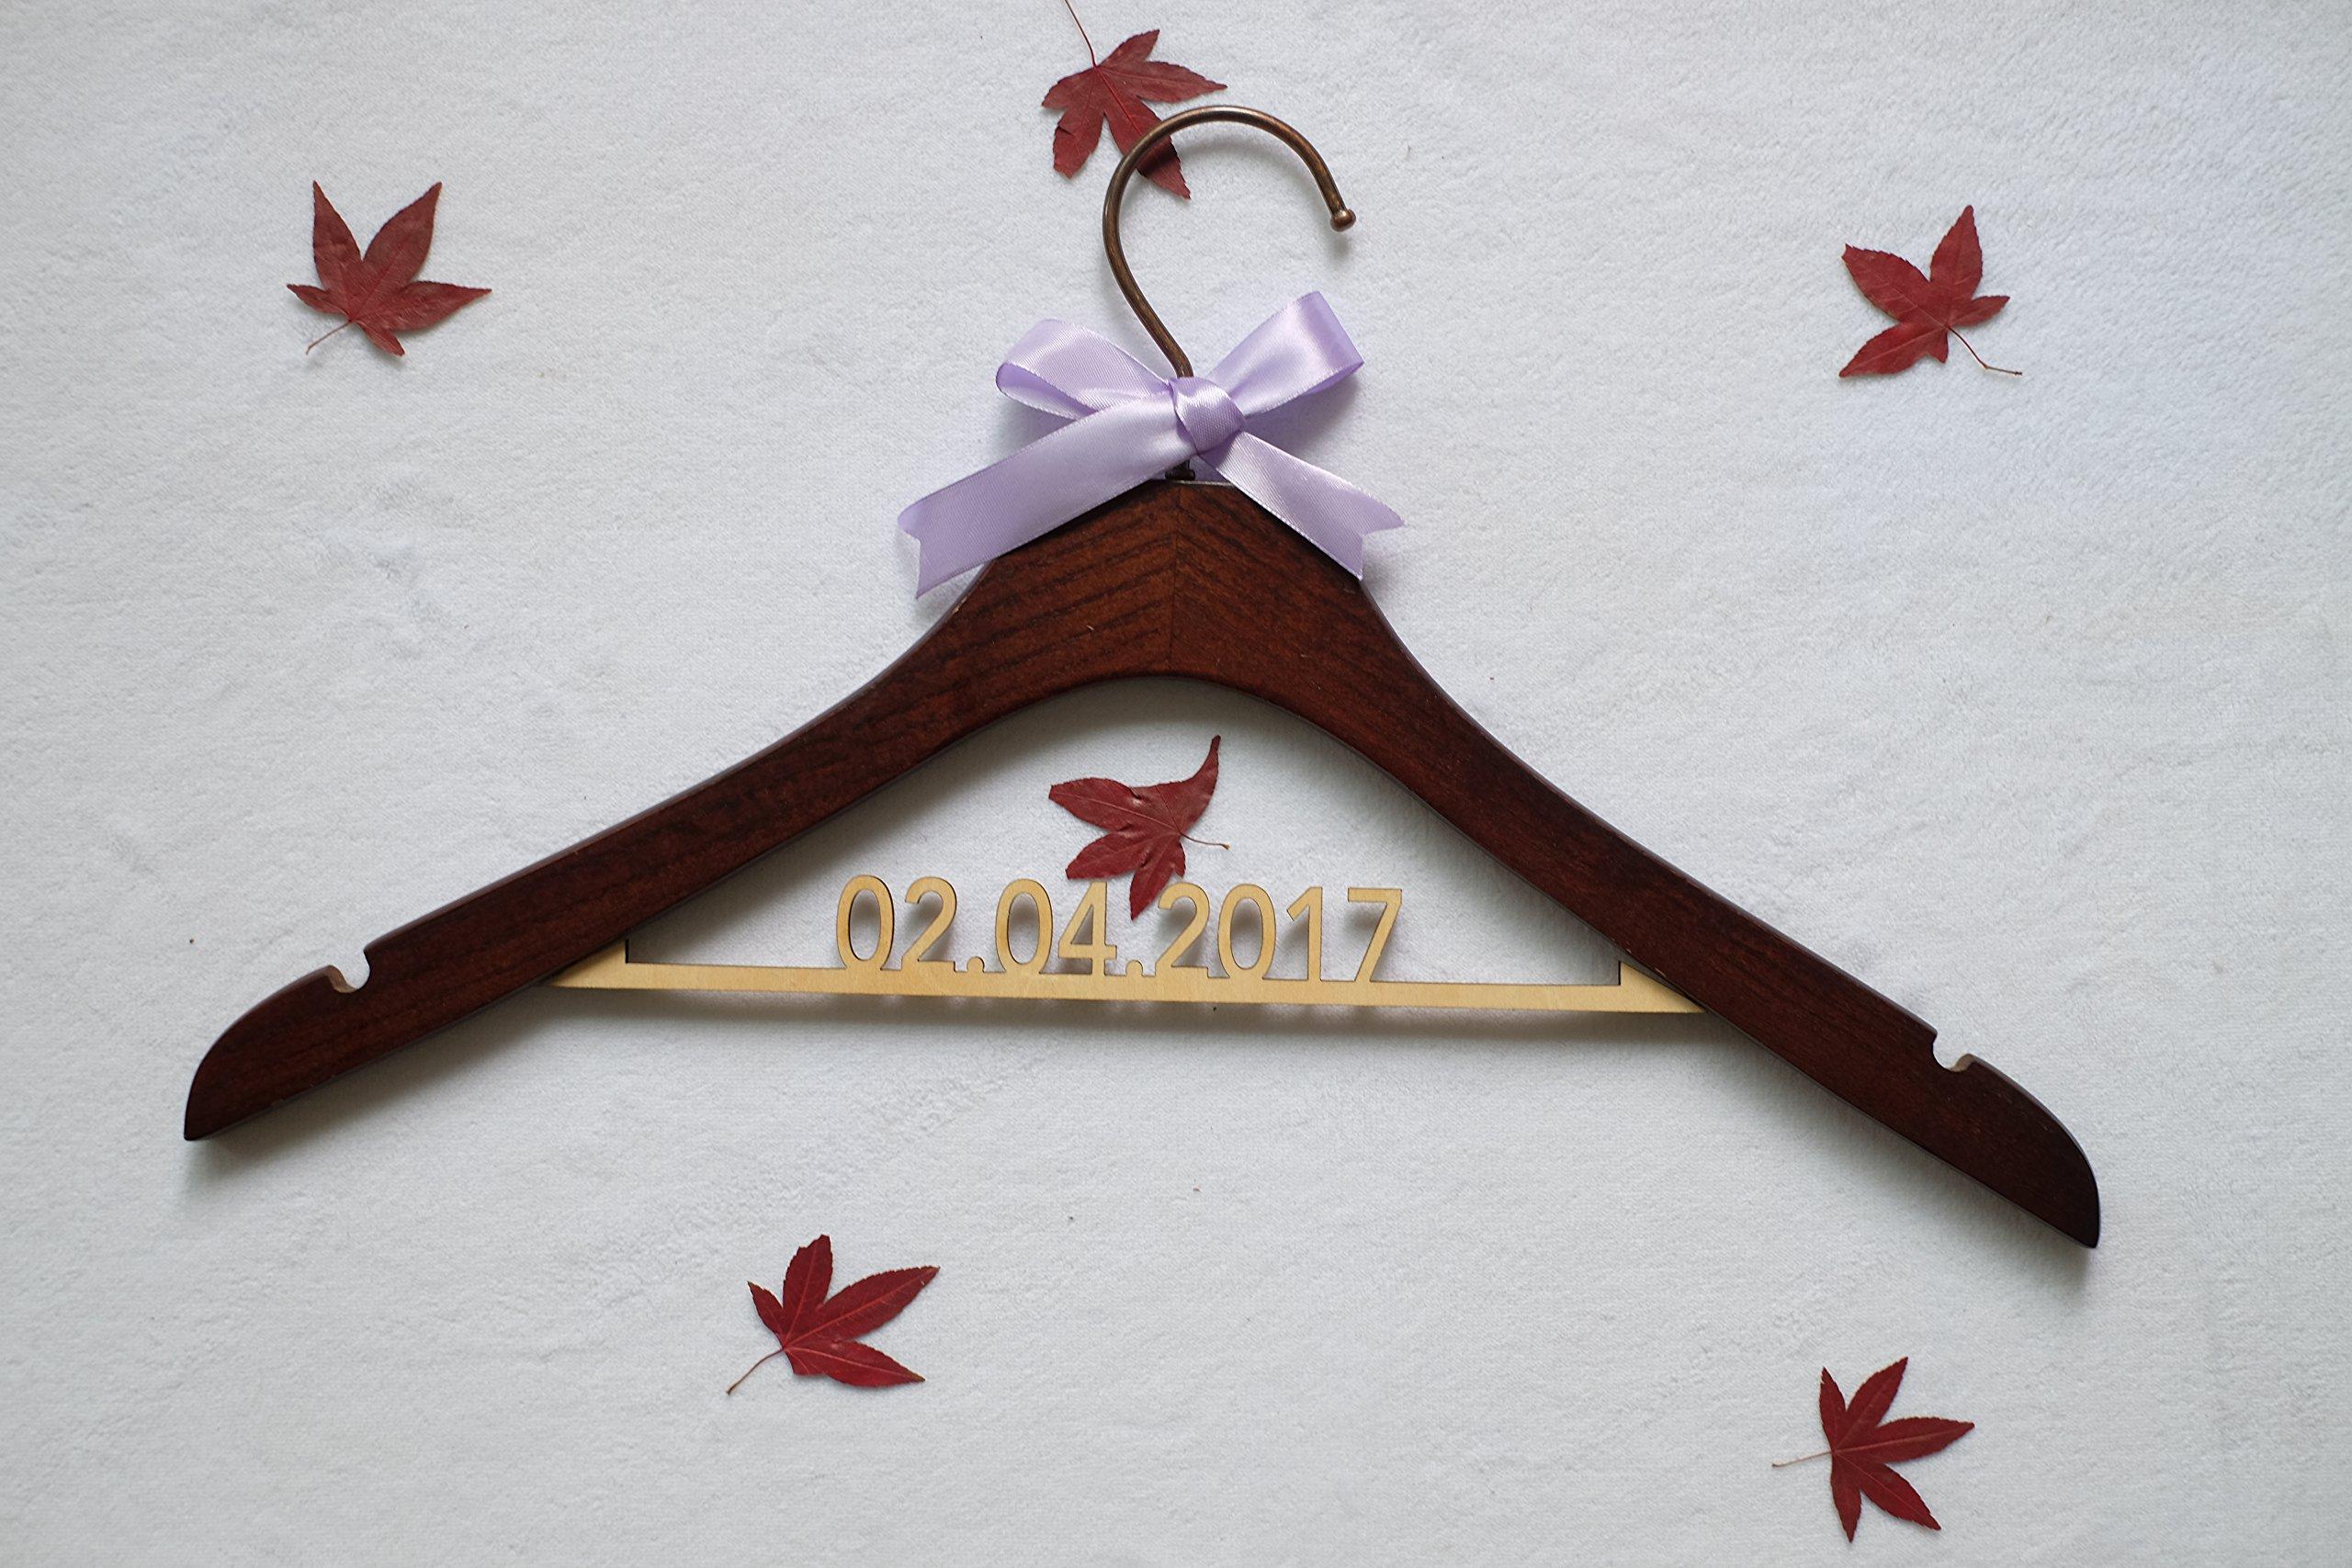 Wedding Dress Hanger Antique With Date Rustic Wood Wedding